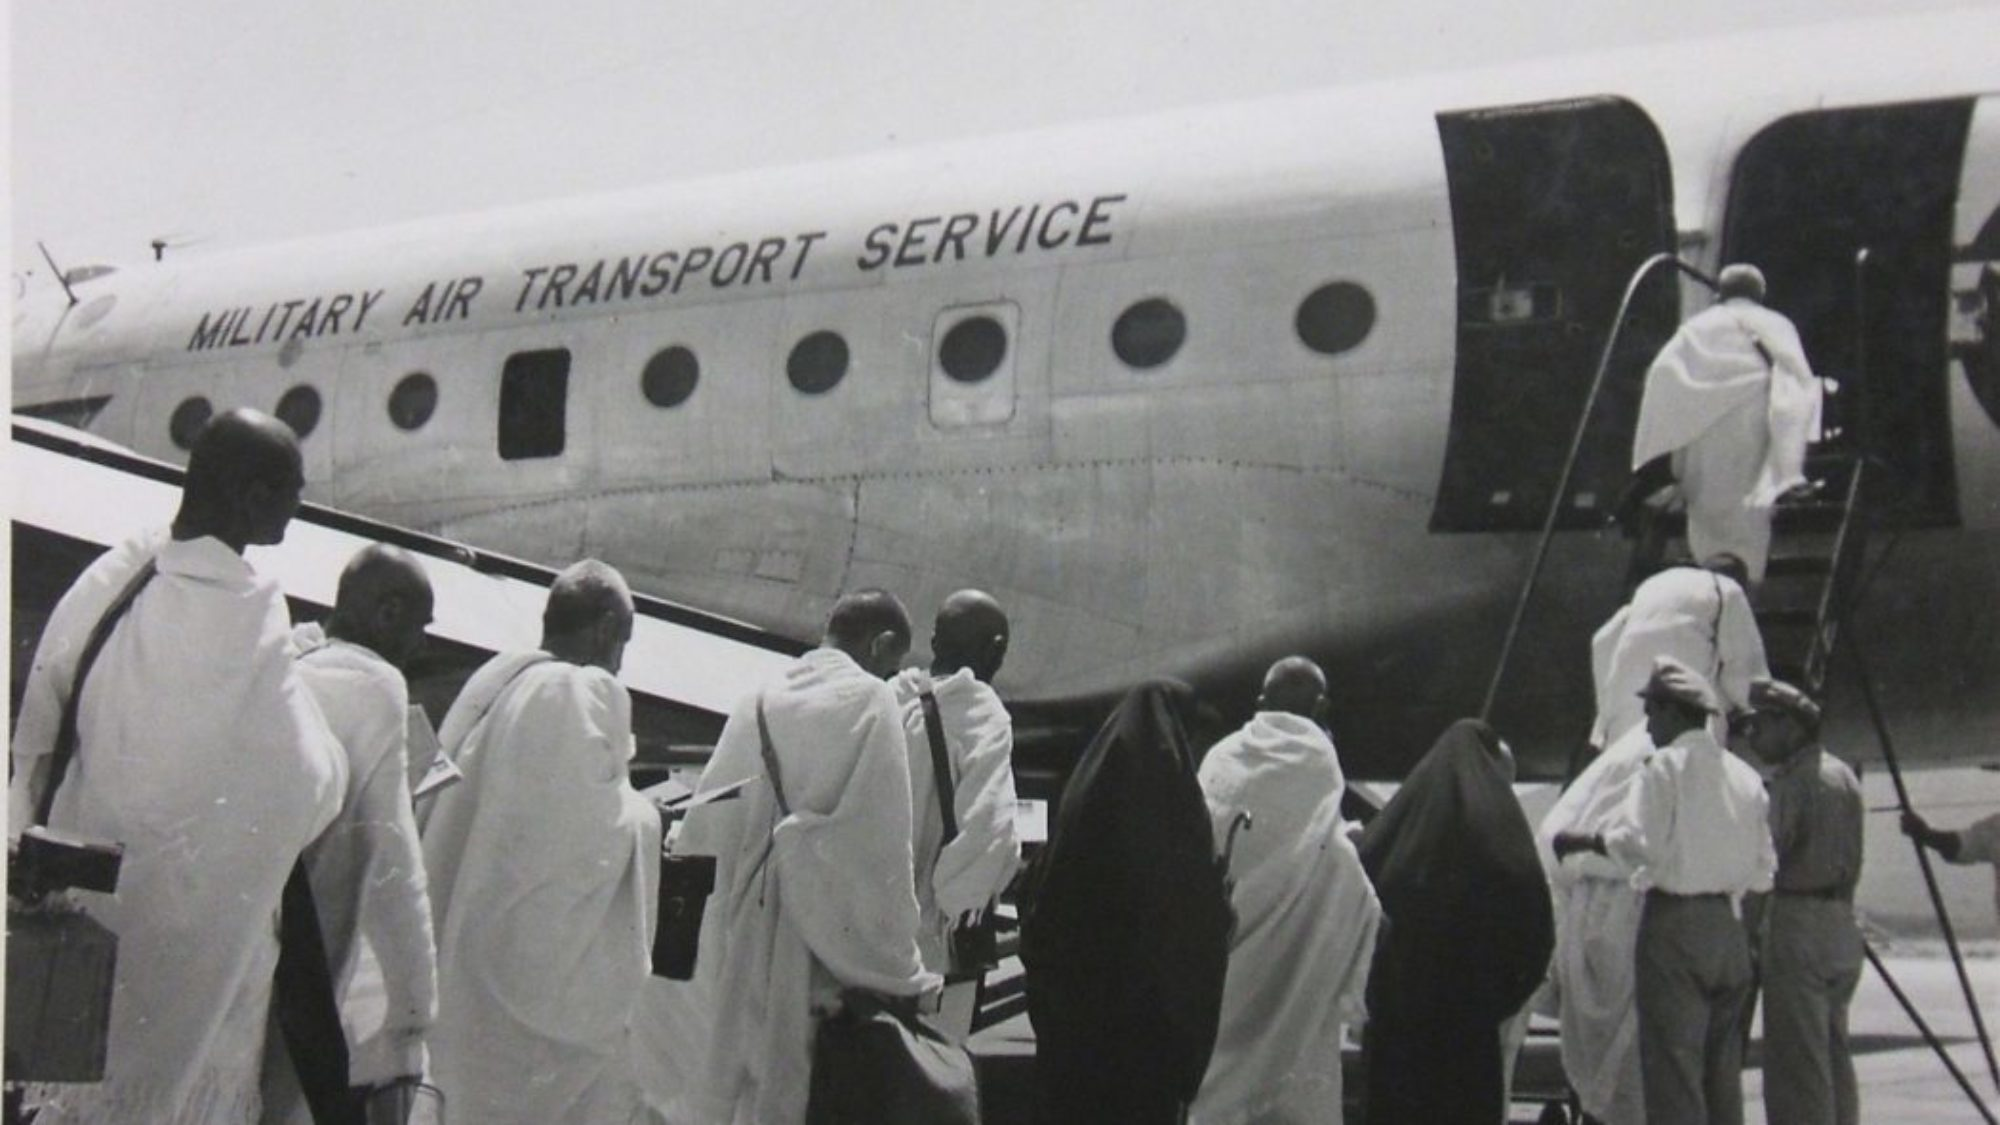 Men boarding military air transport plane